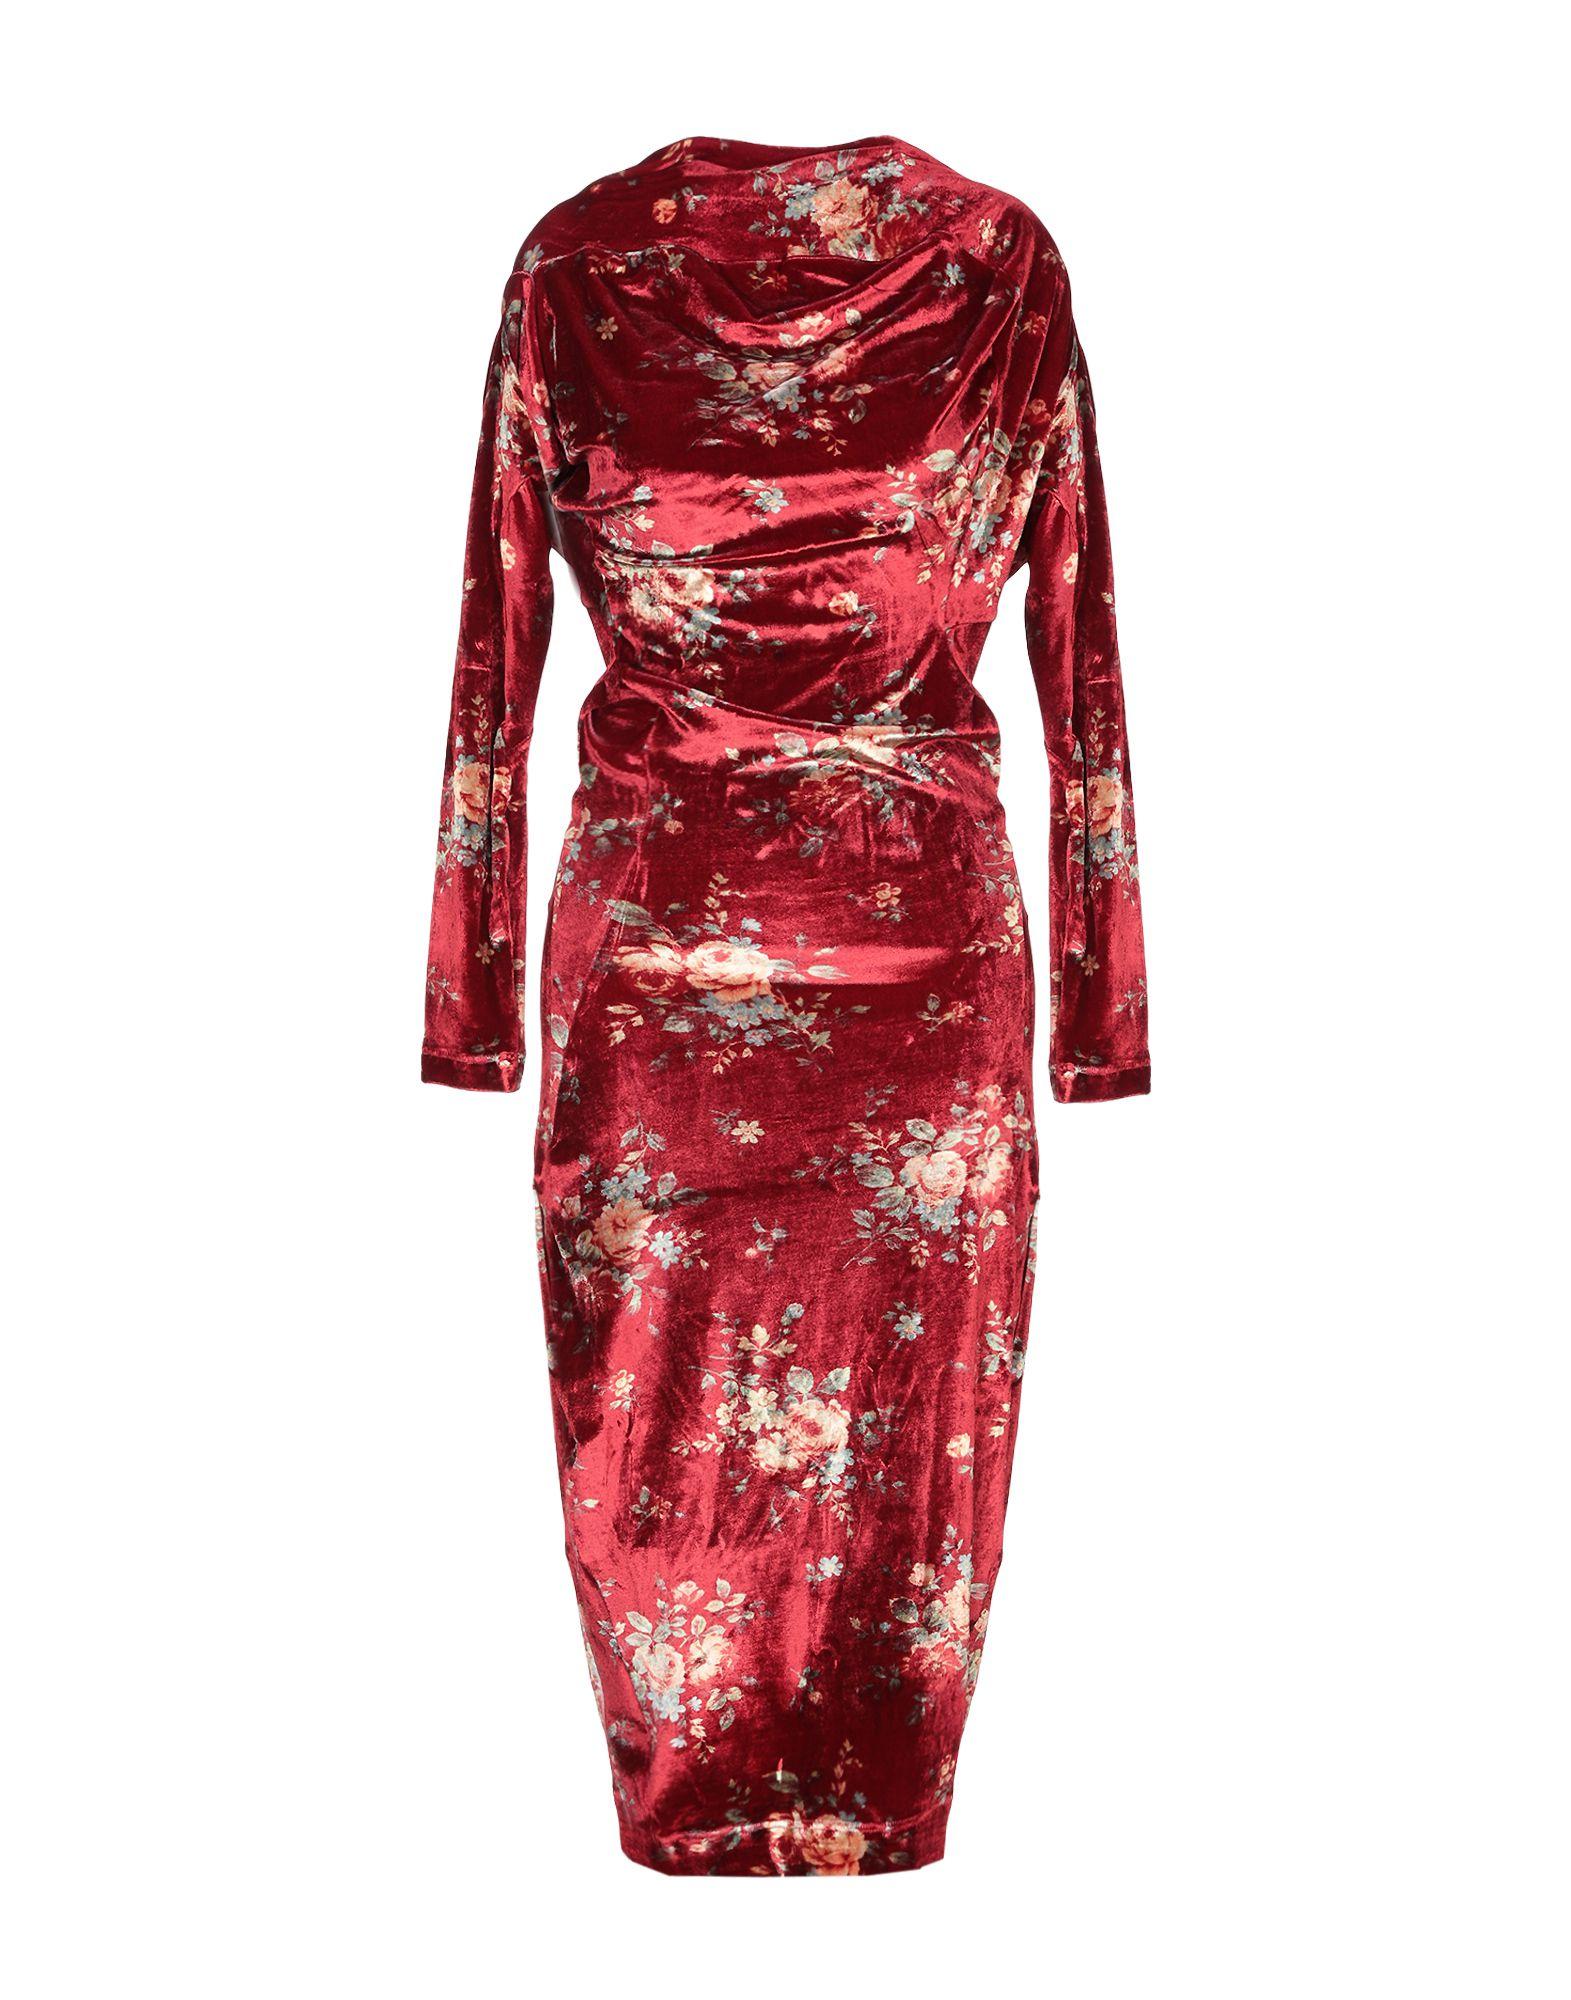 ANDREAS KRONTHALER x VIVIENNE WESTWOOD Платье длиной 3/4